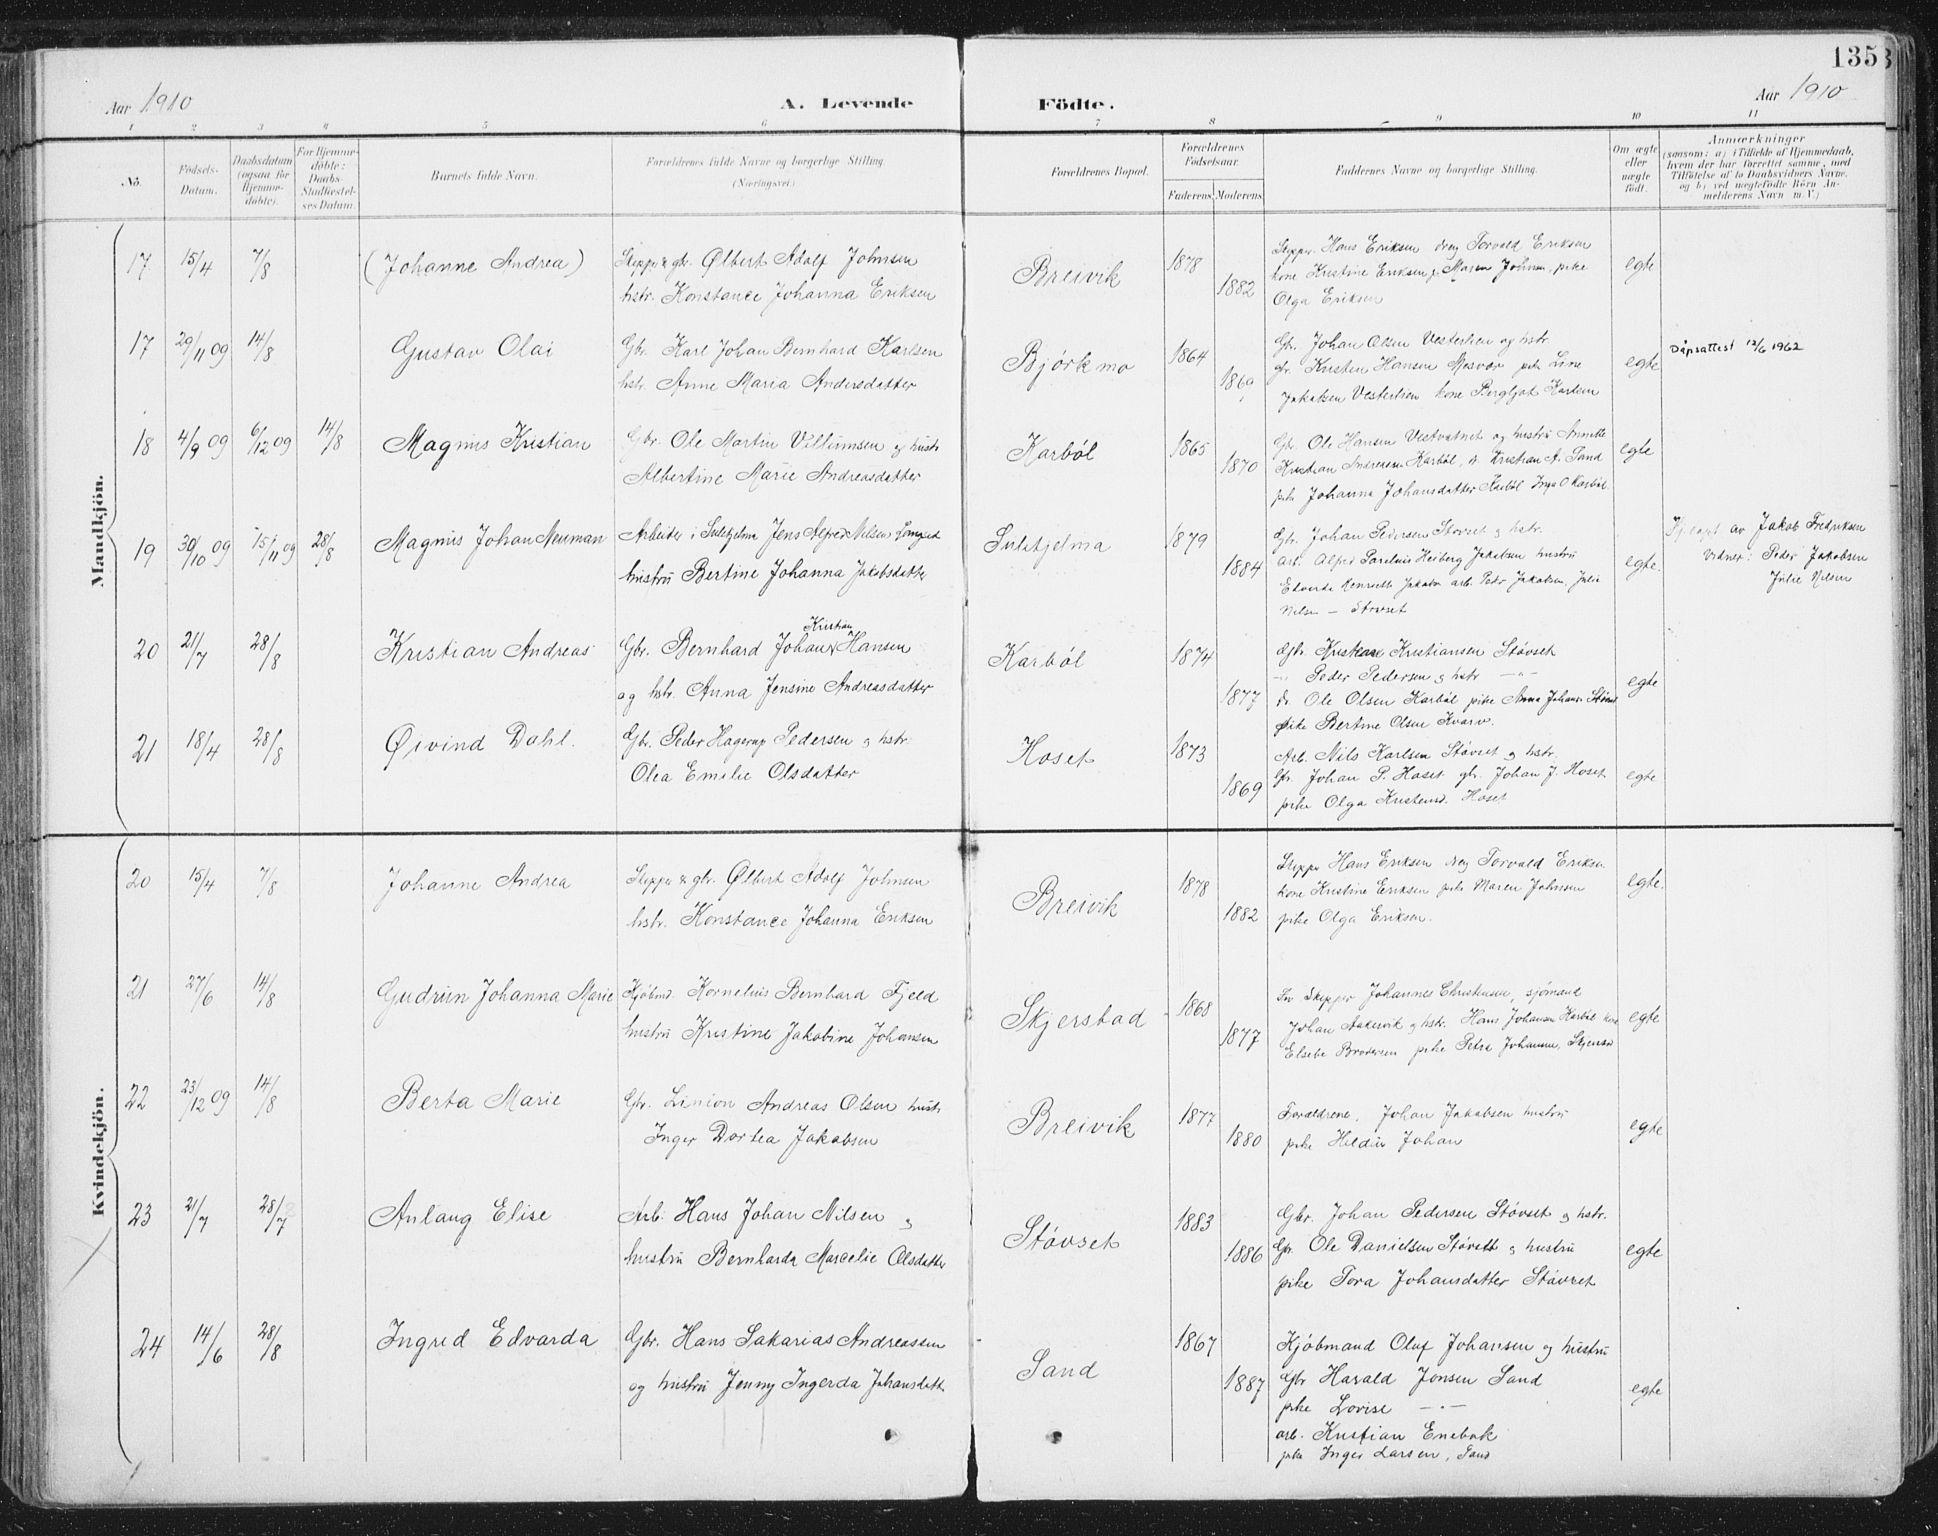 SAT, Ministerialprotokoller, klokkerbøker og fødselsregistre - Nordland, 852/L0741: Ministerialbok nr. 852A11, 1894-1917, s. 135